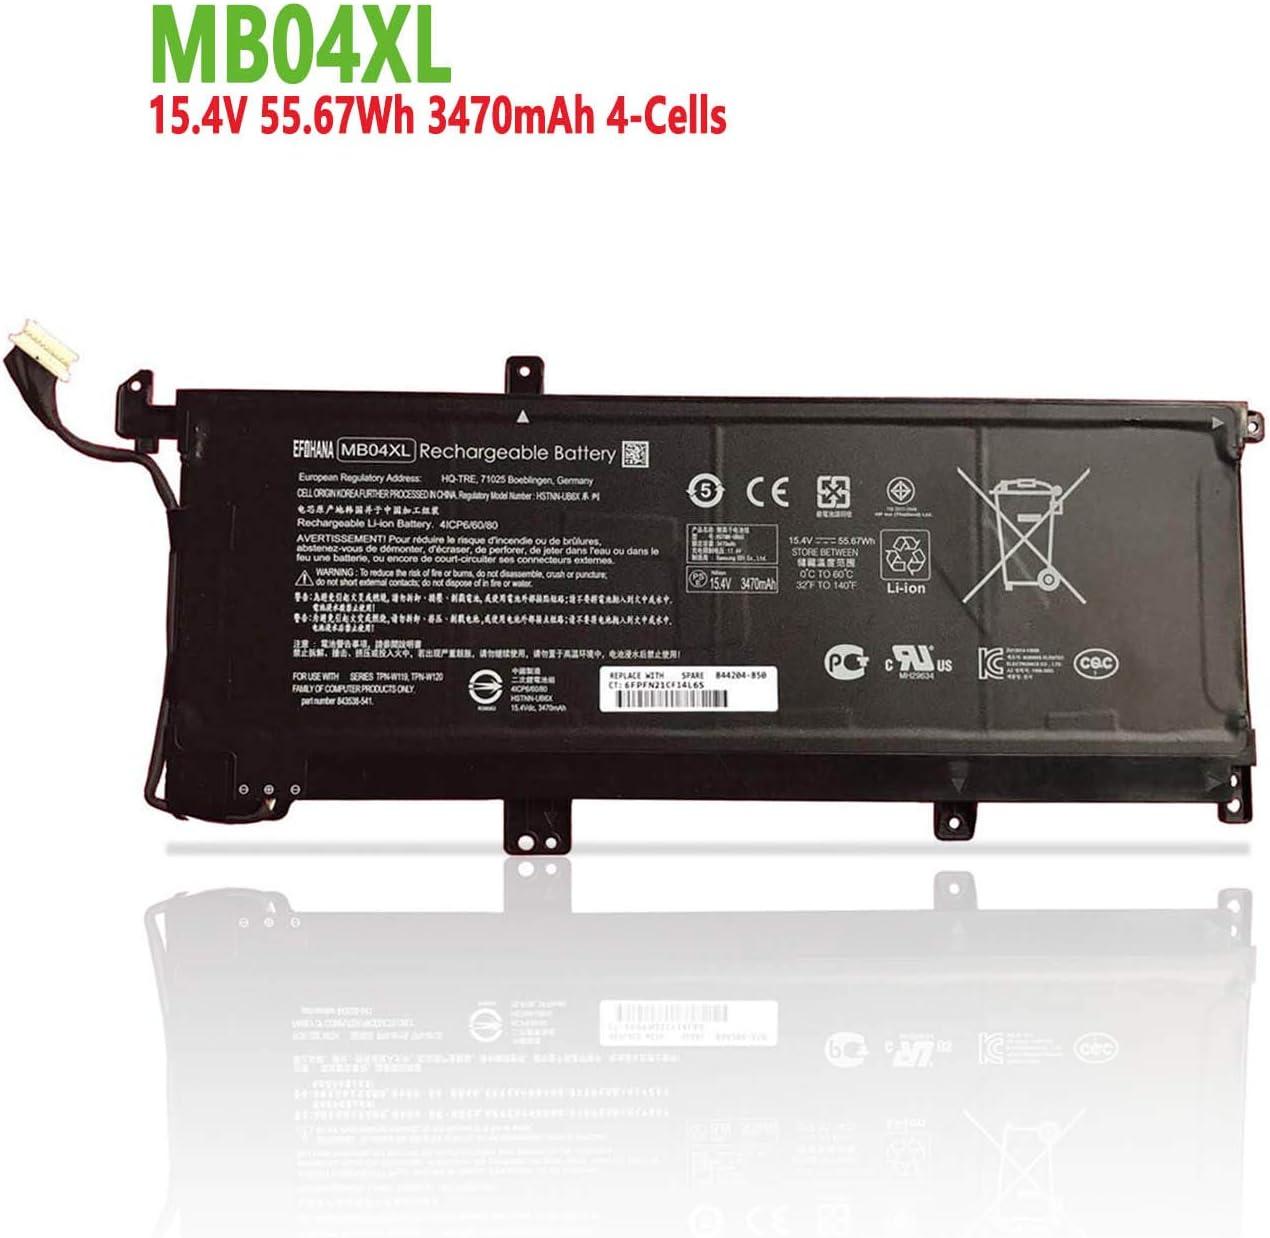 efohana MB04XL Laptop Battery Replacement for HP Envy X360 M6 M6-AQ000 15 inch 15-AQ100 Convertible PC Series MBO4XL HSTNN-UB6X TPN-W119 TPN-W120 843538-541 844204-850 15.4V 55.67Wh 3470mAh